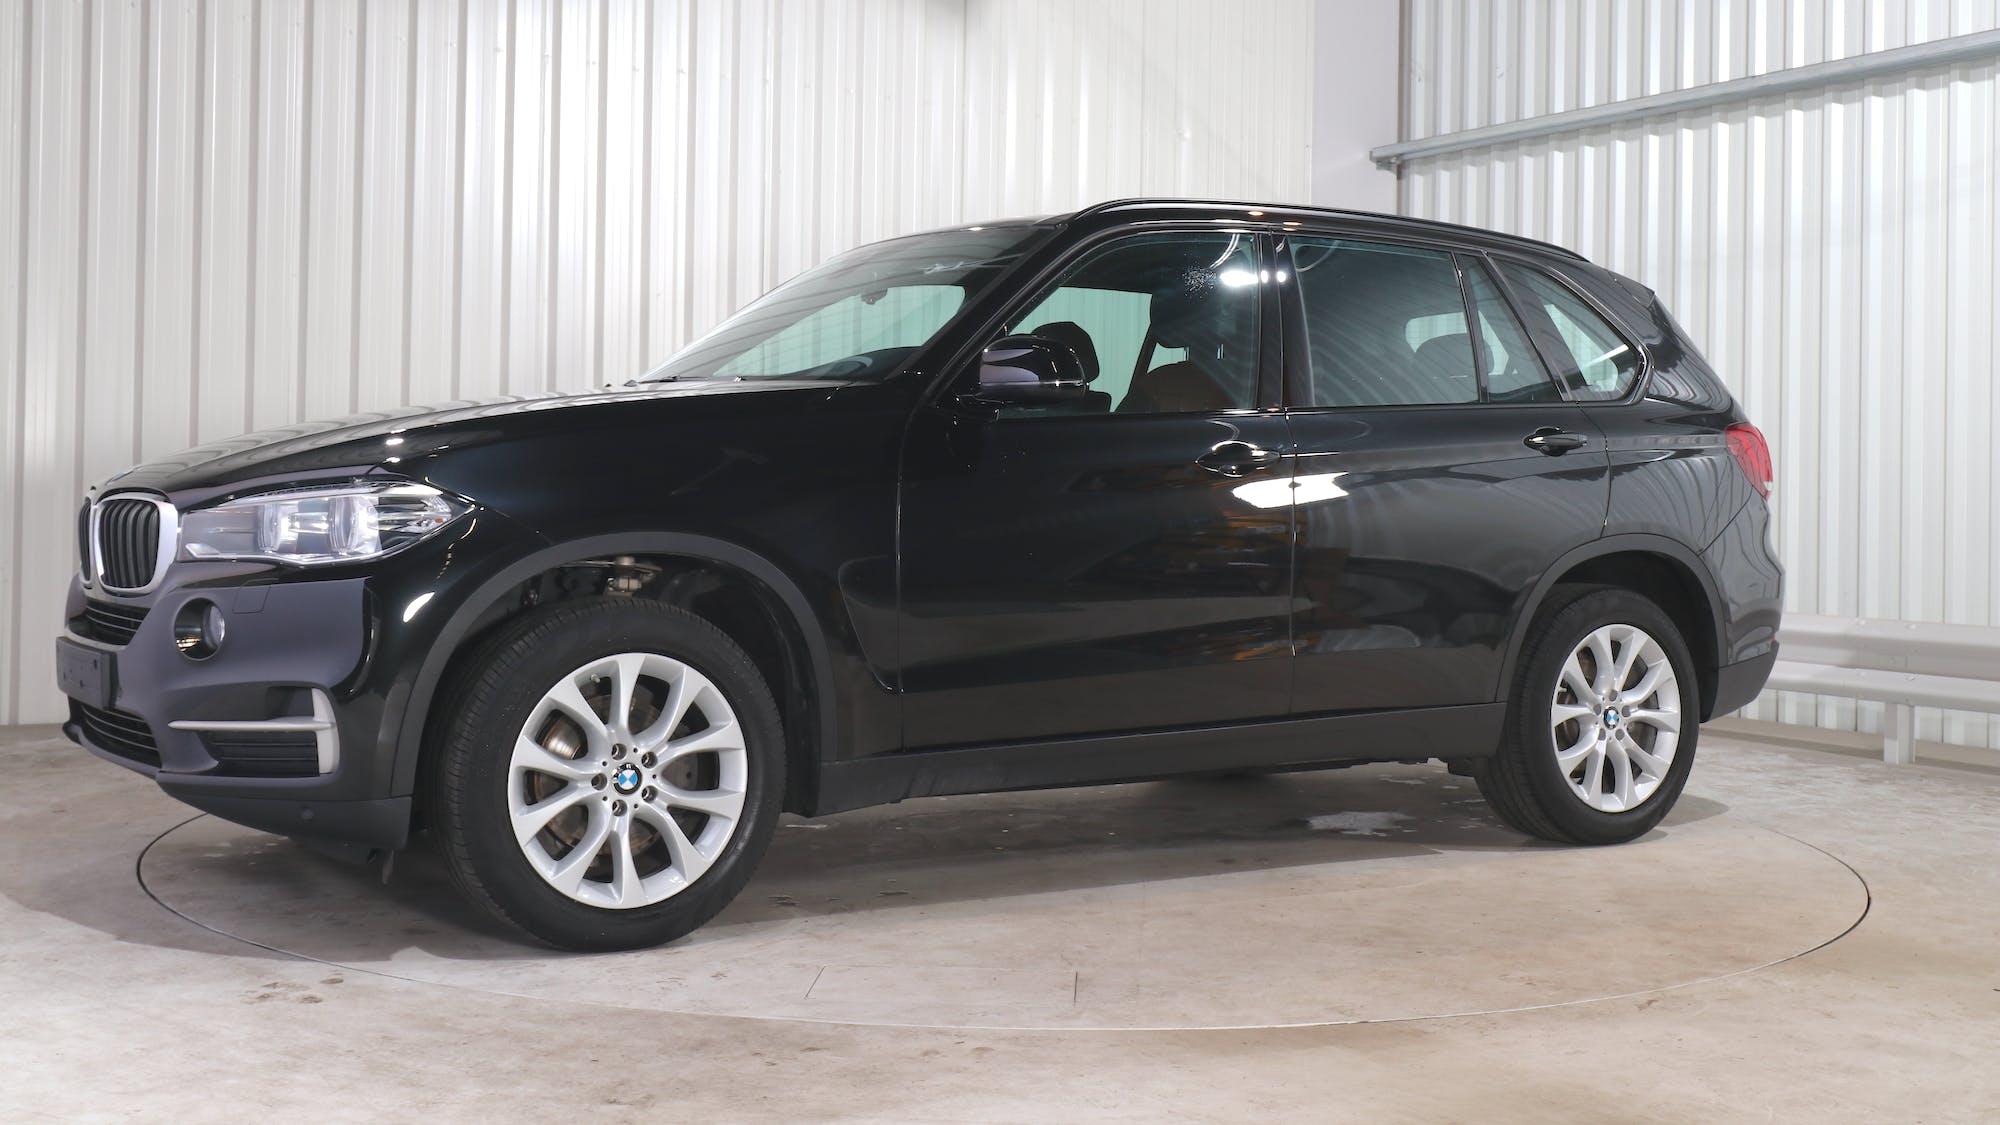 BMW X5 leasing exterior 1